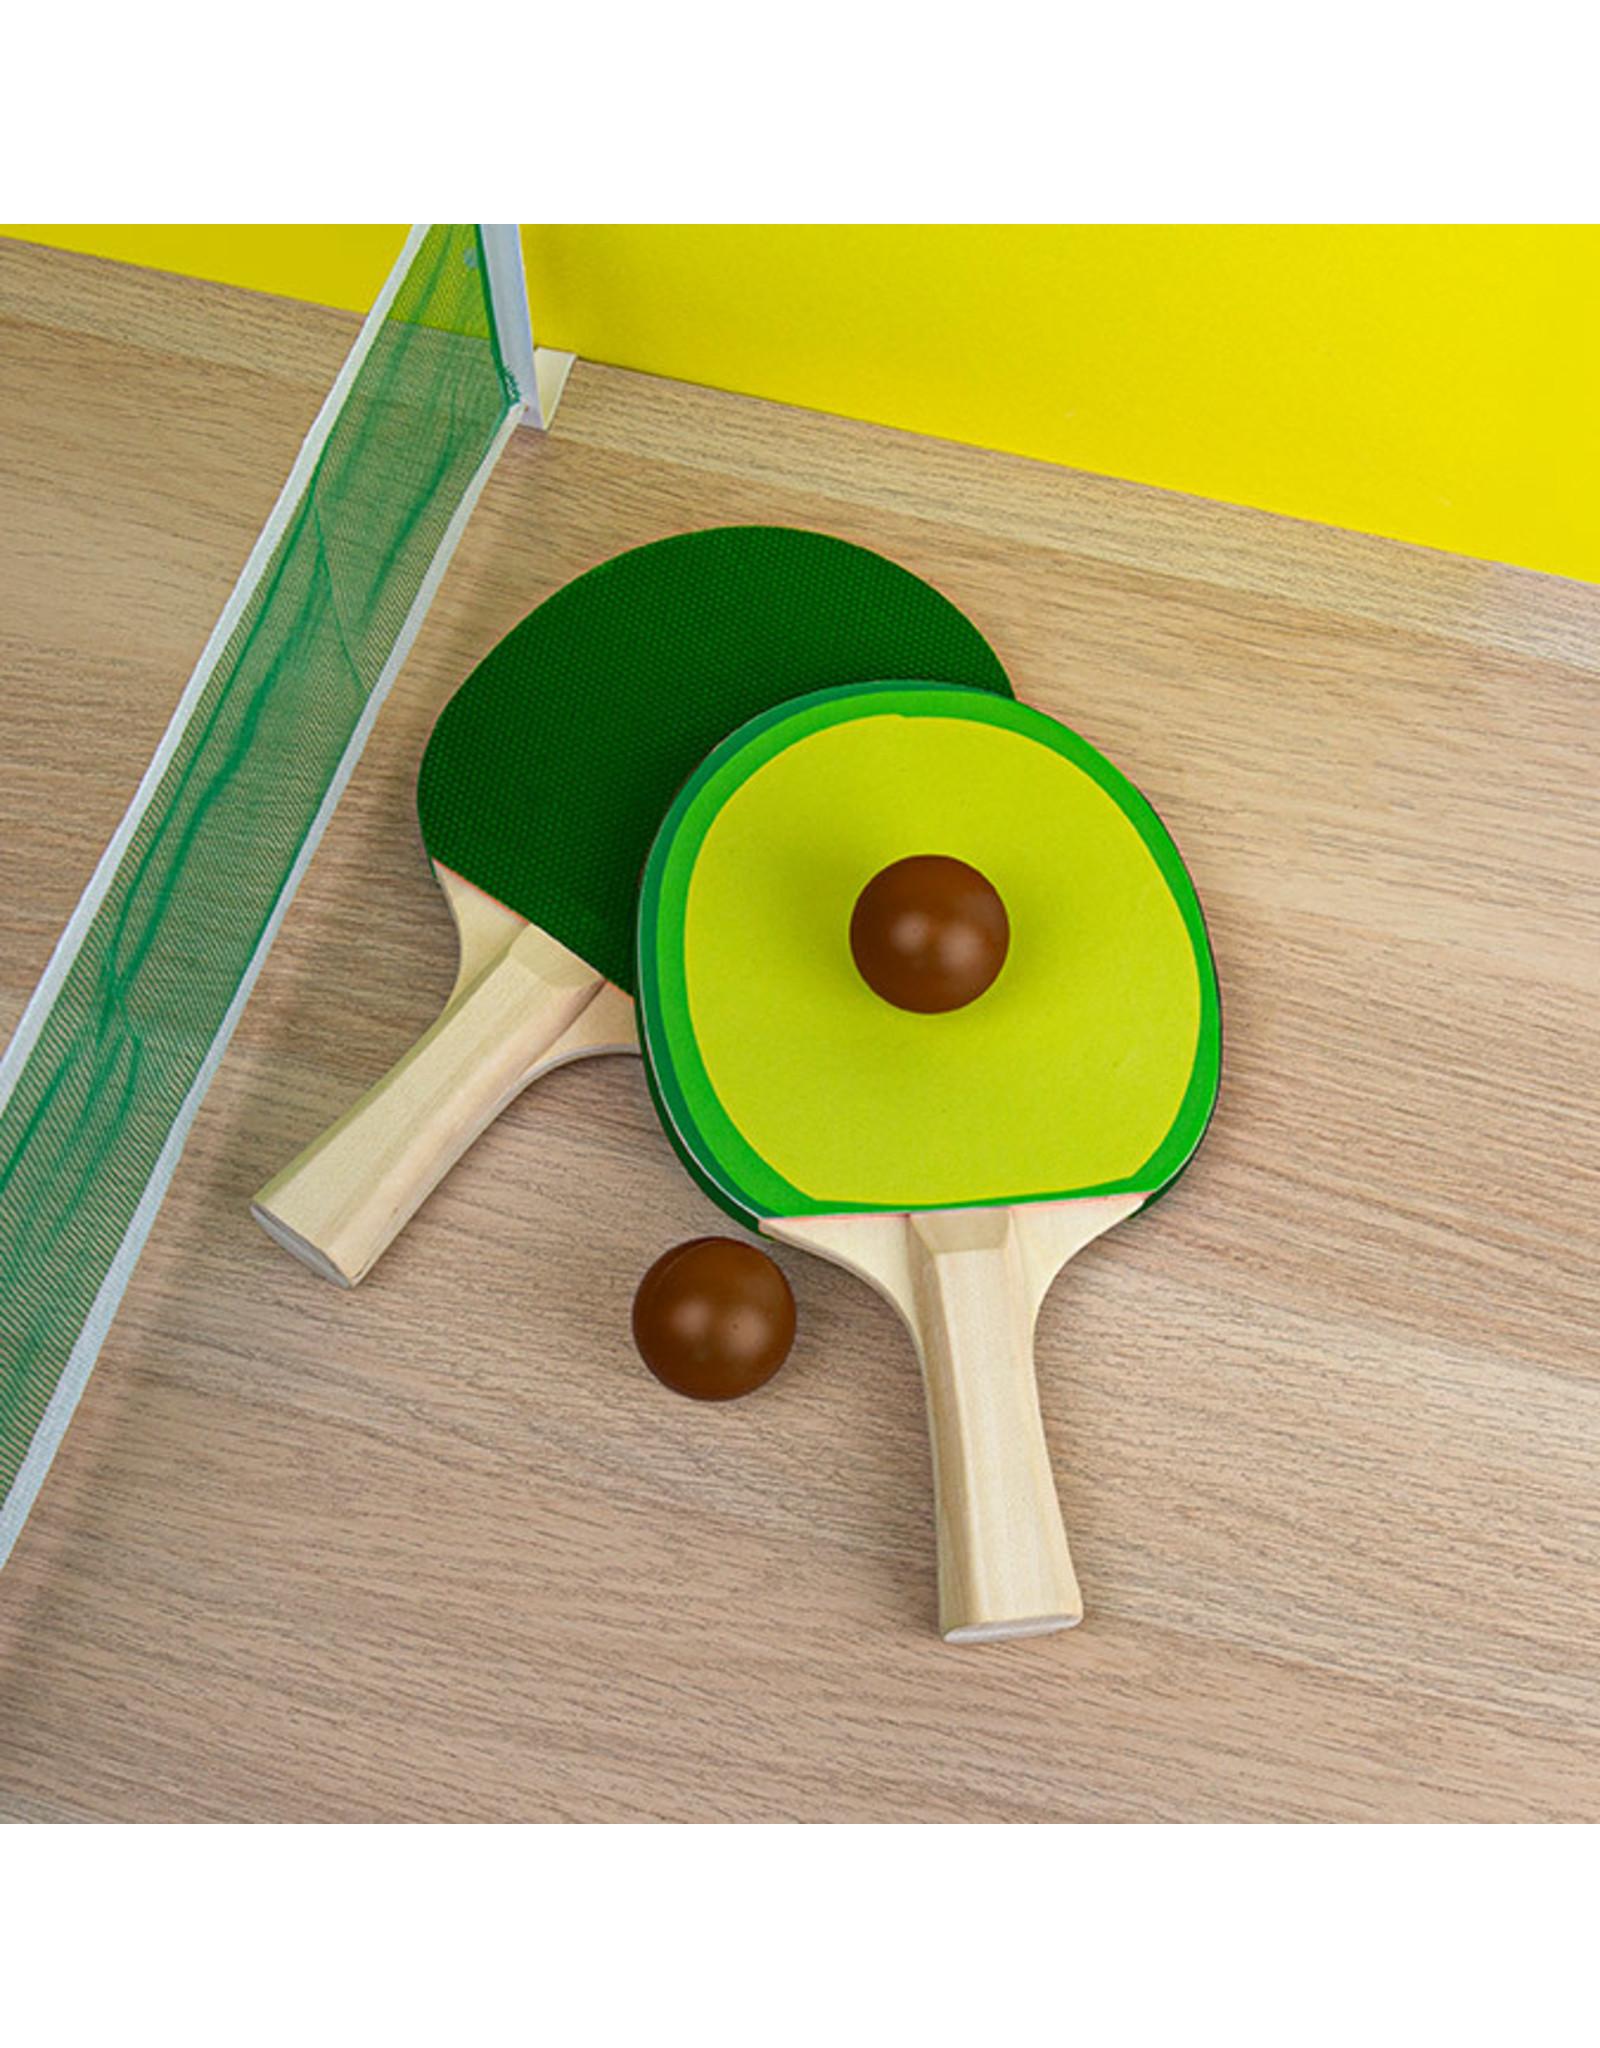 Avocado ping pong